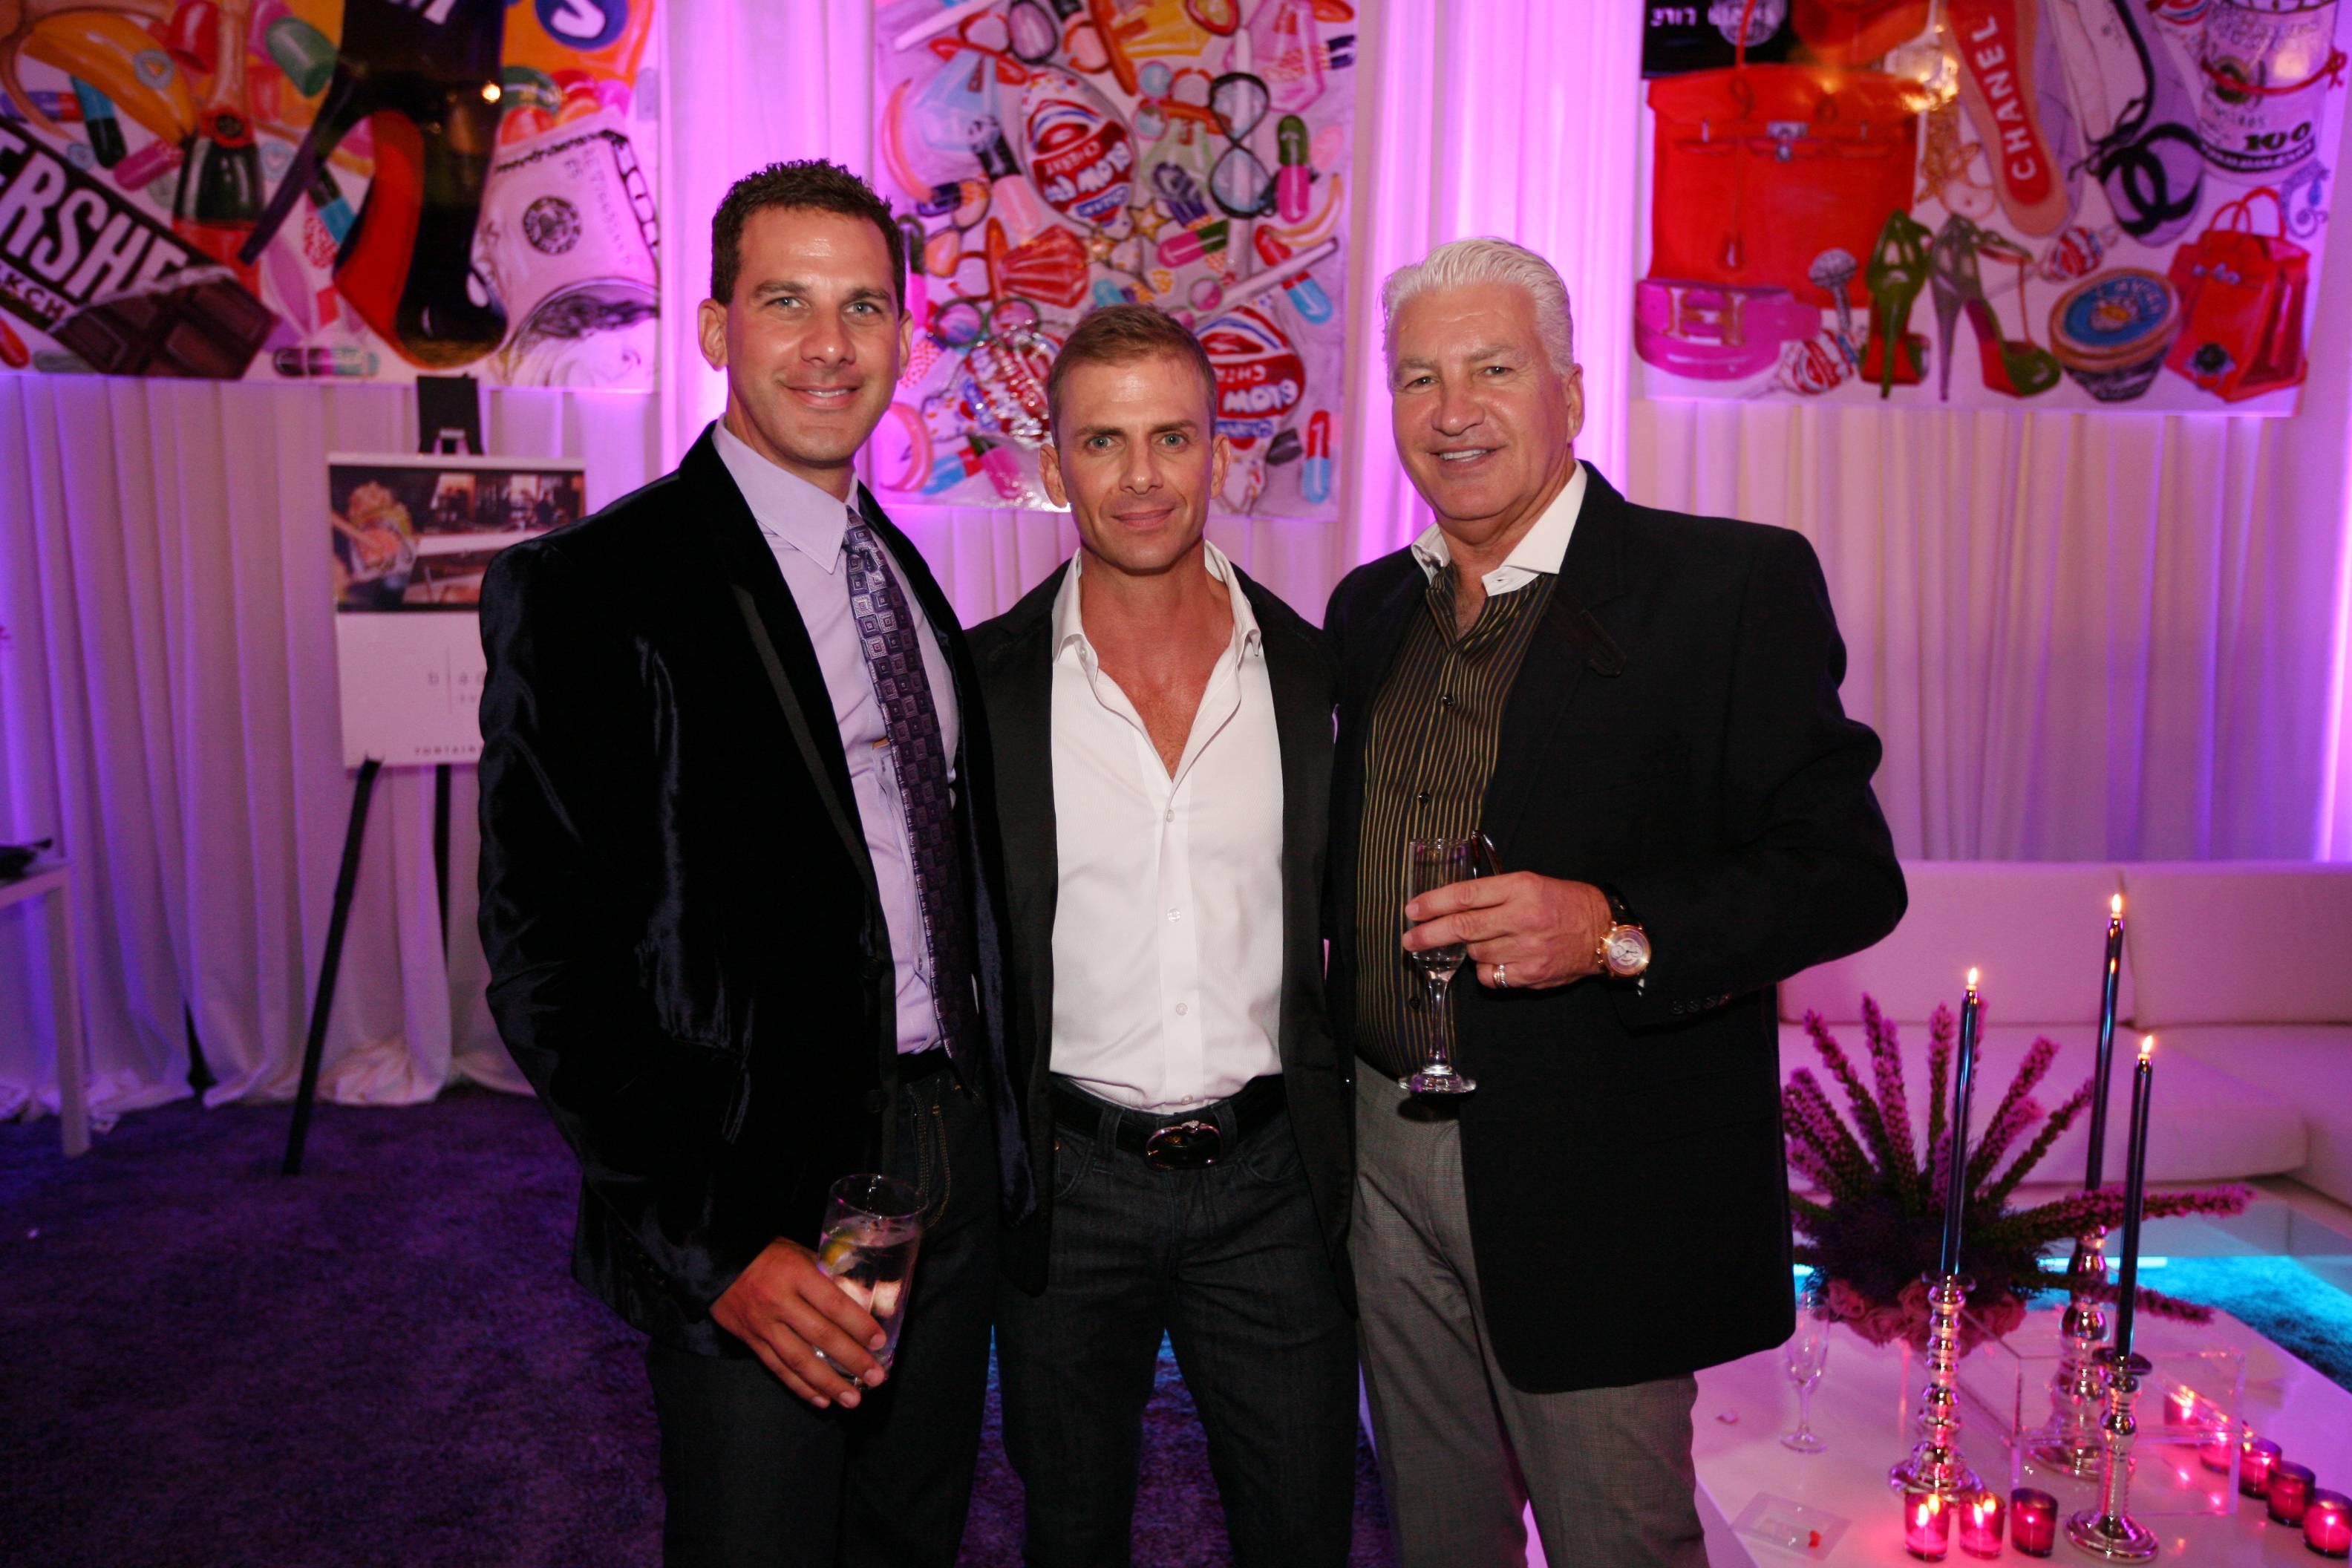 Joe Fava, Mr. Yurant, &John Lozitto